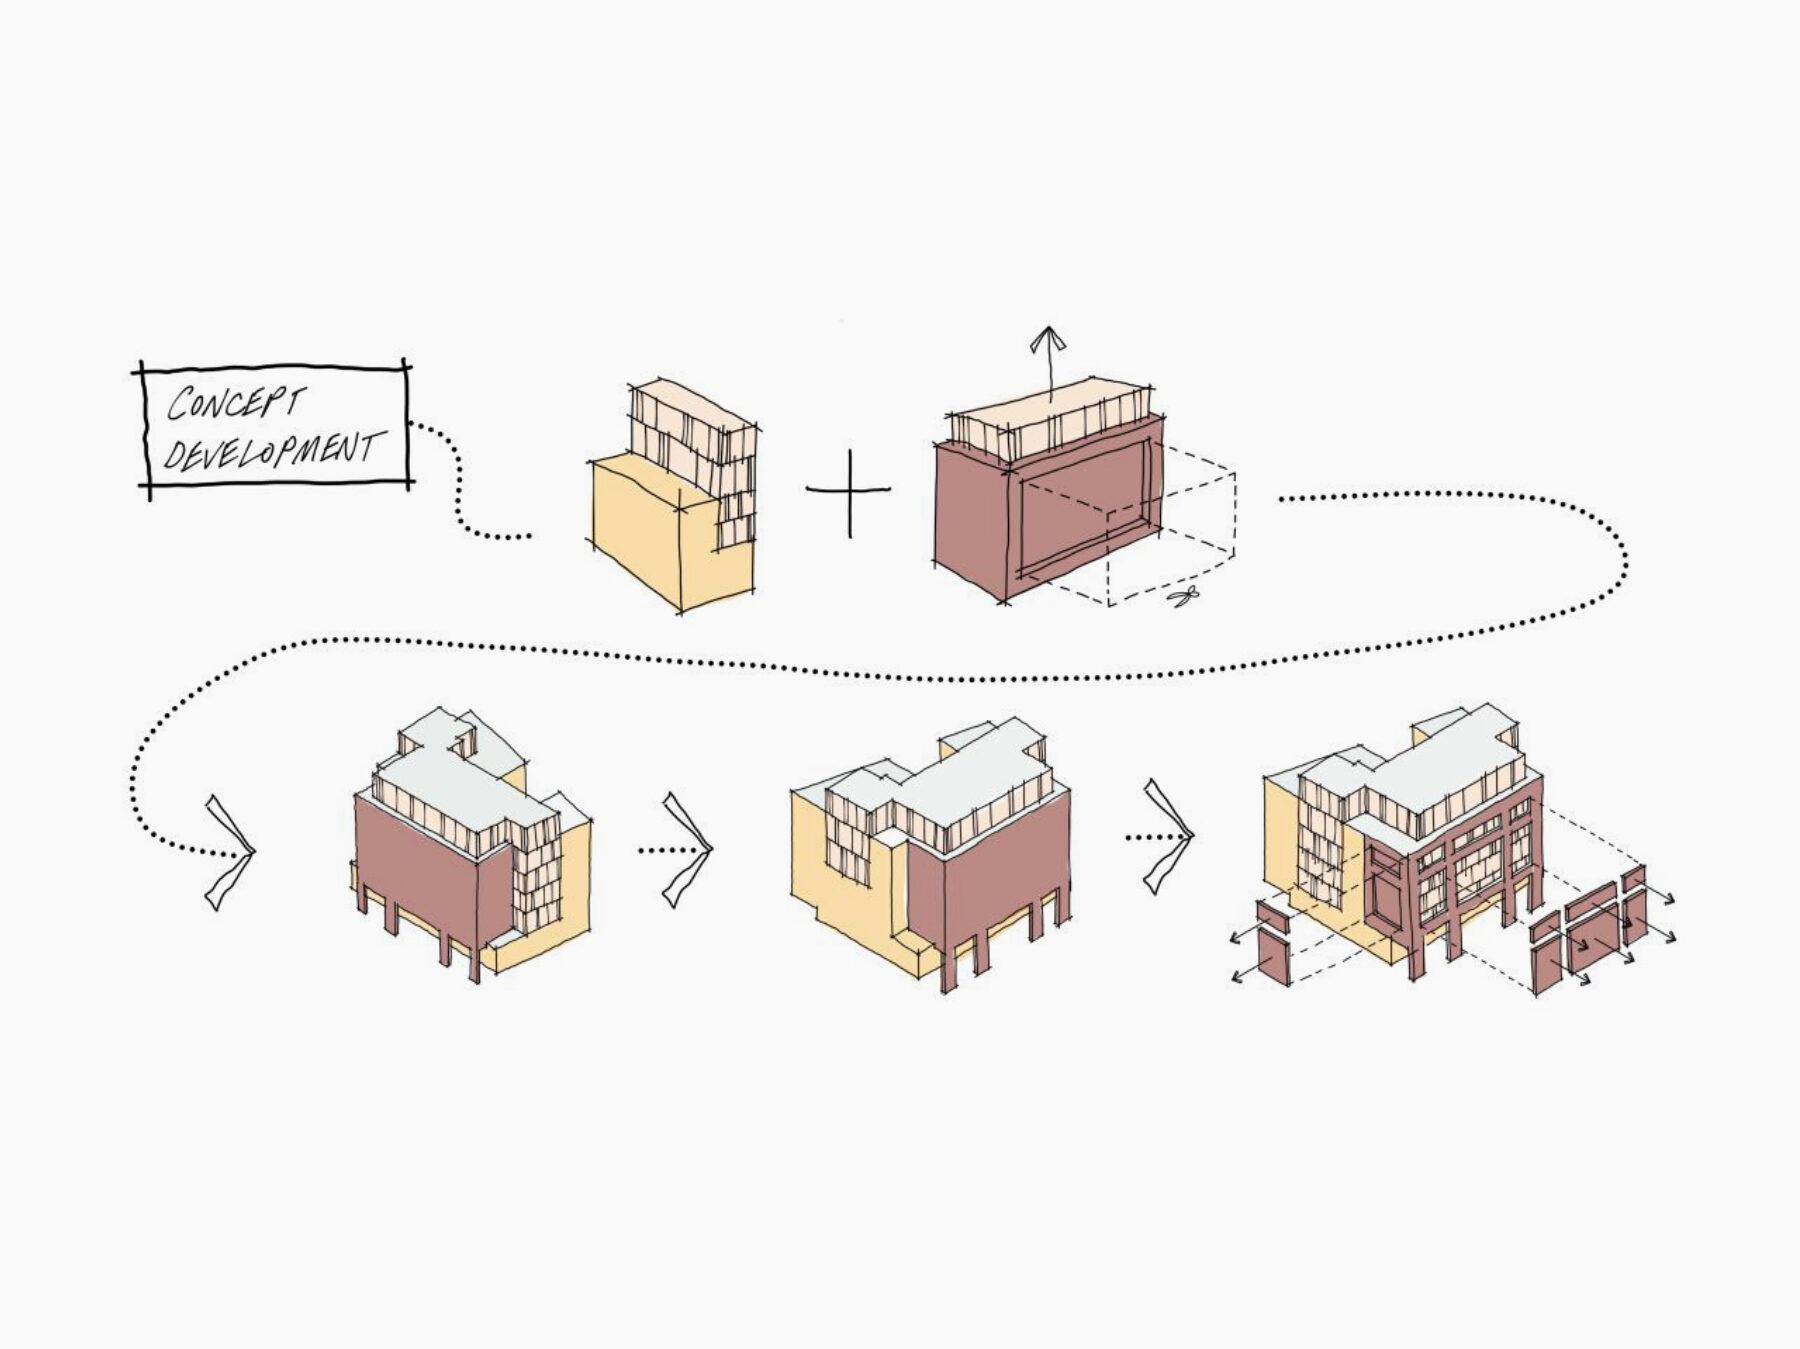 Architectural concept development diagram